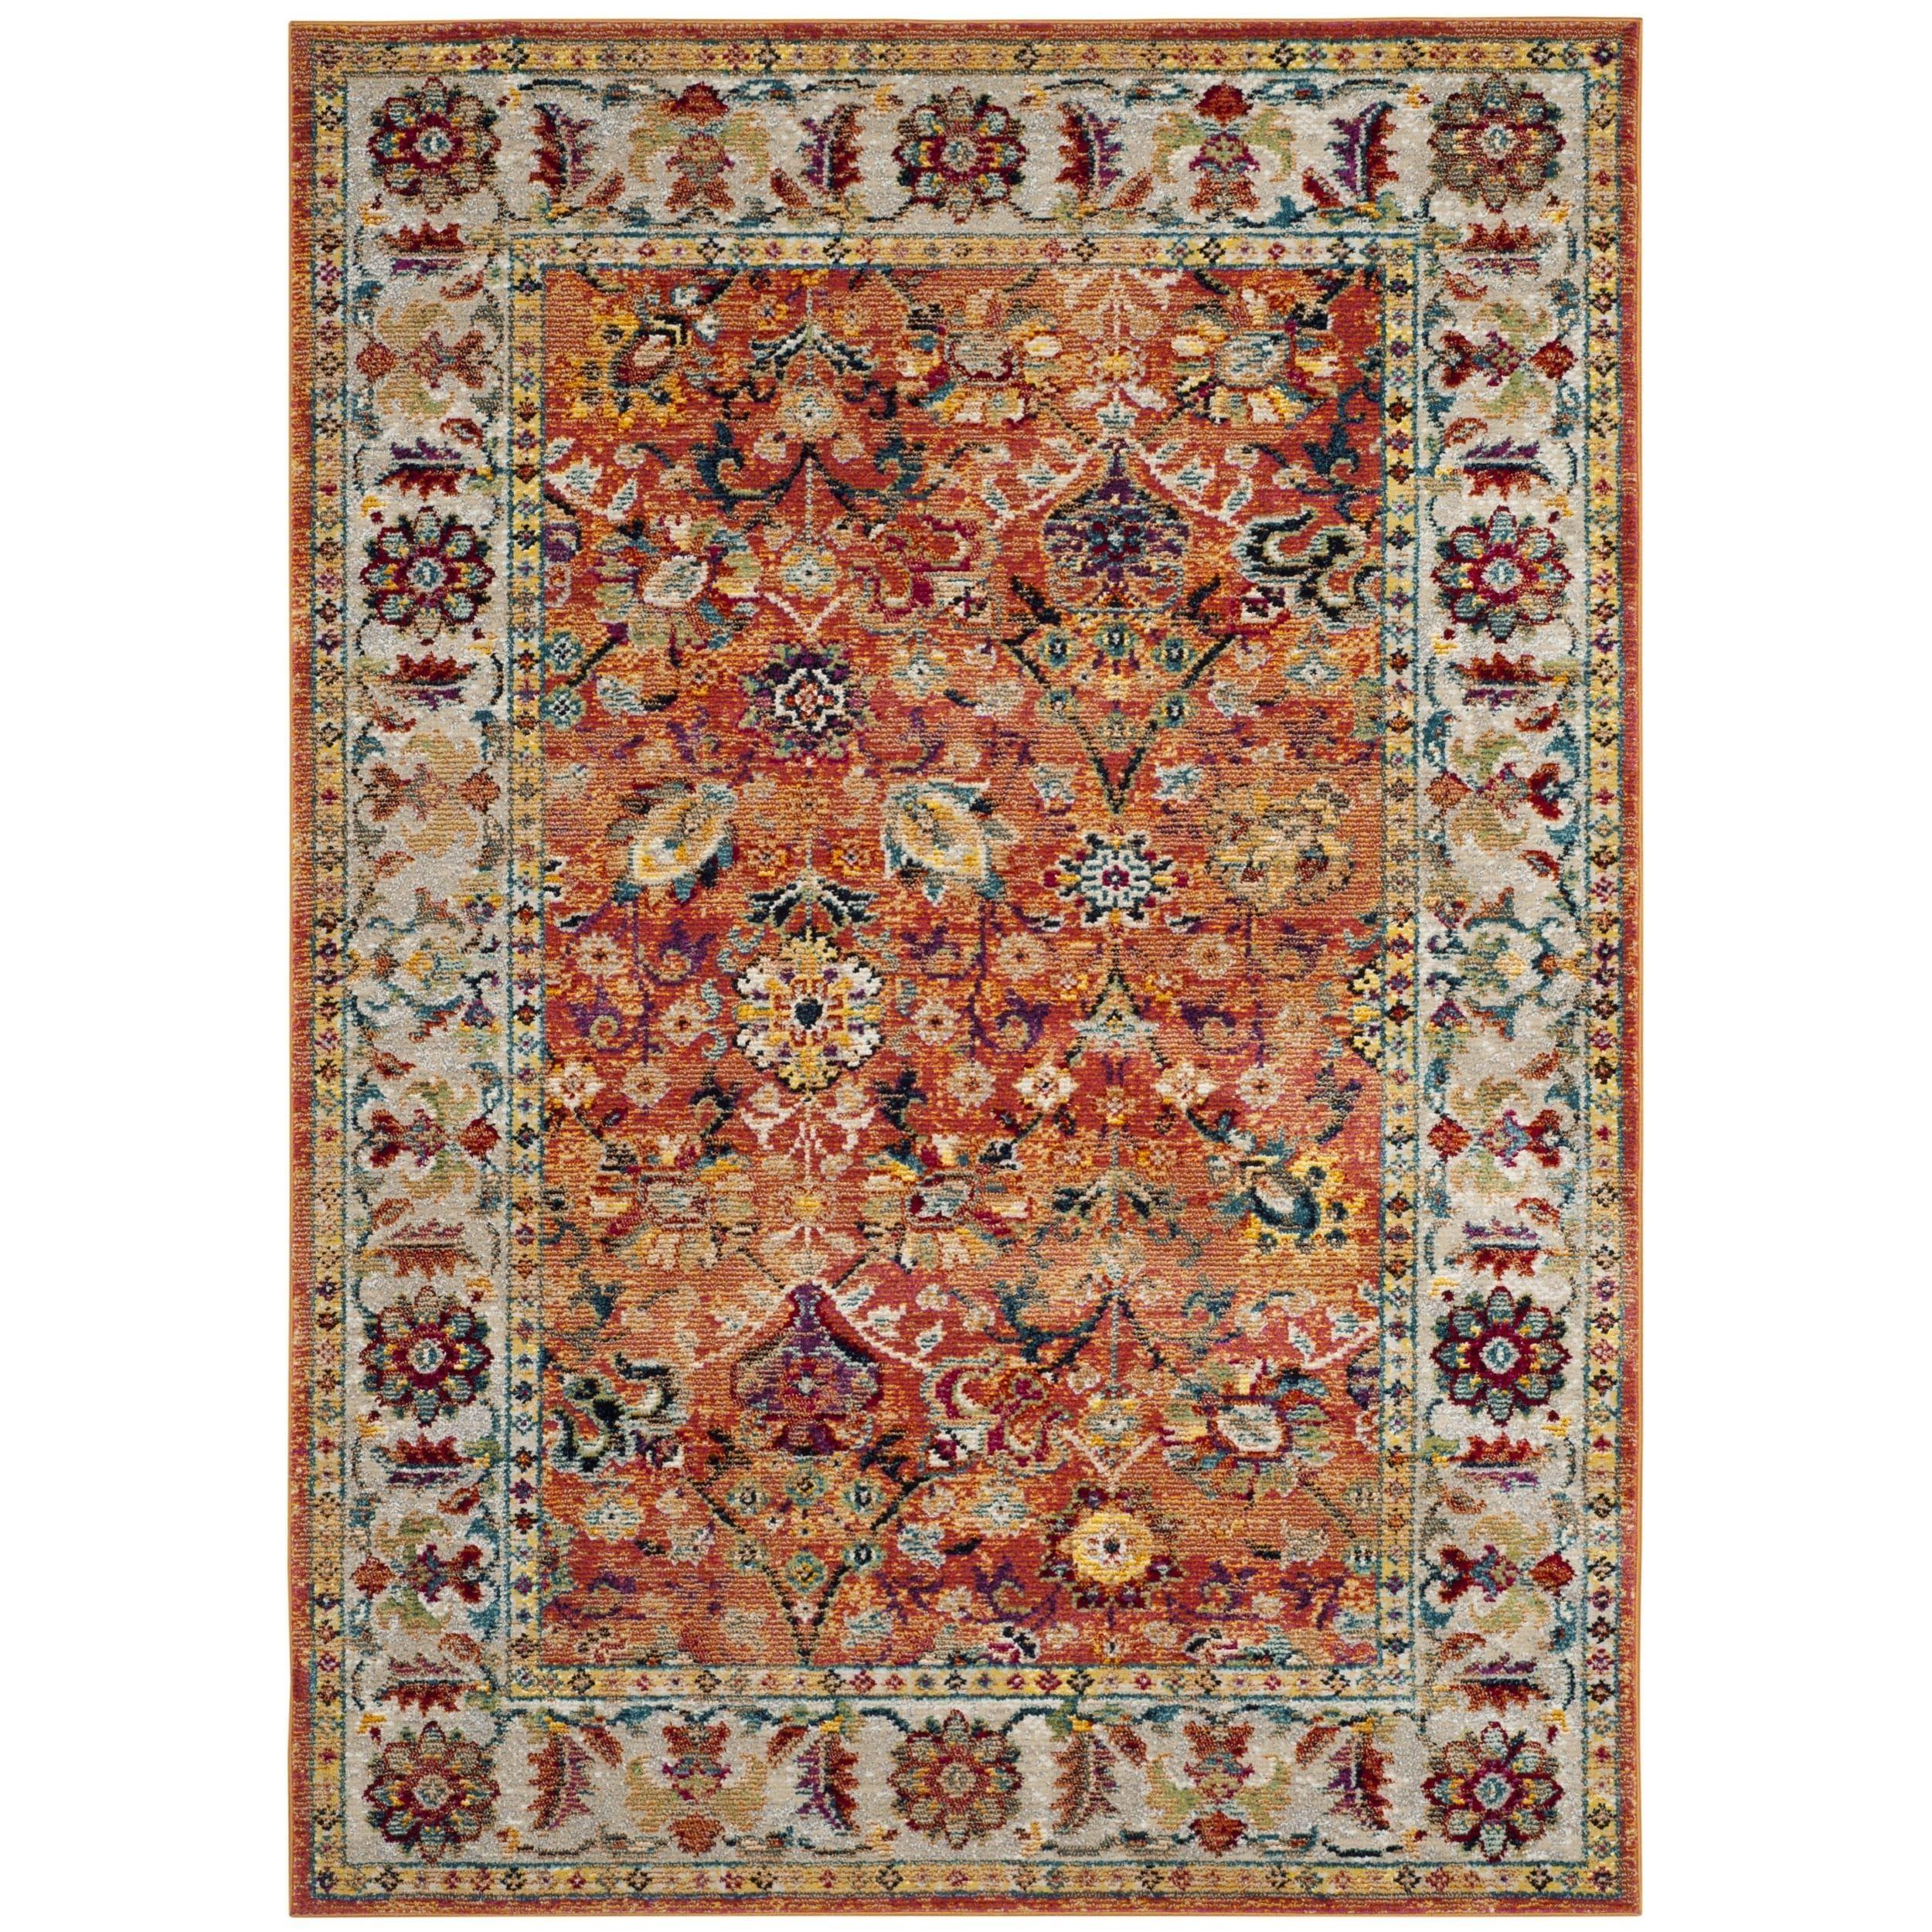 home turkish ft large bohemian fullxfull carpet snkn il rug x p wool vintage decor handmade cm